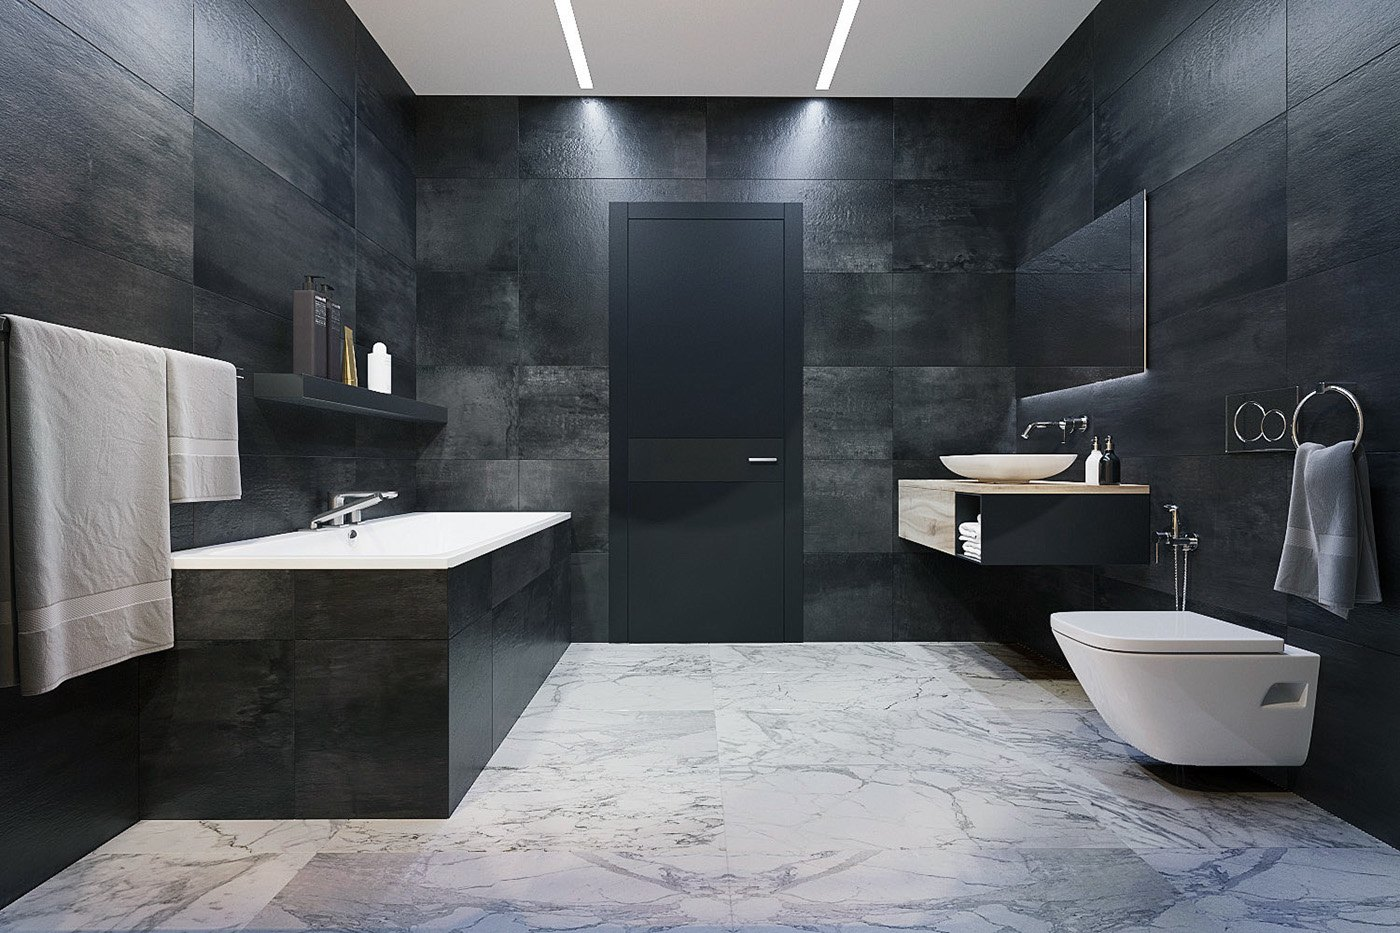 luxury gray and white bathroom